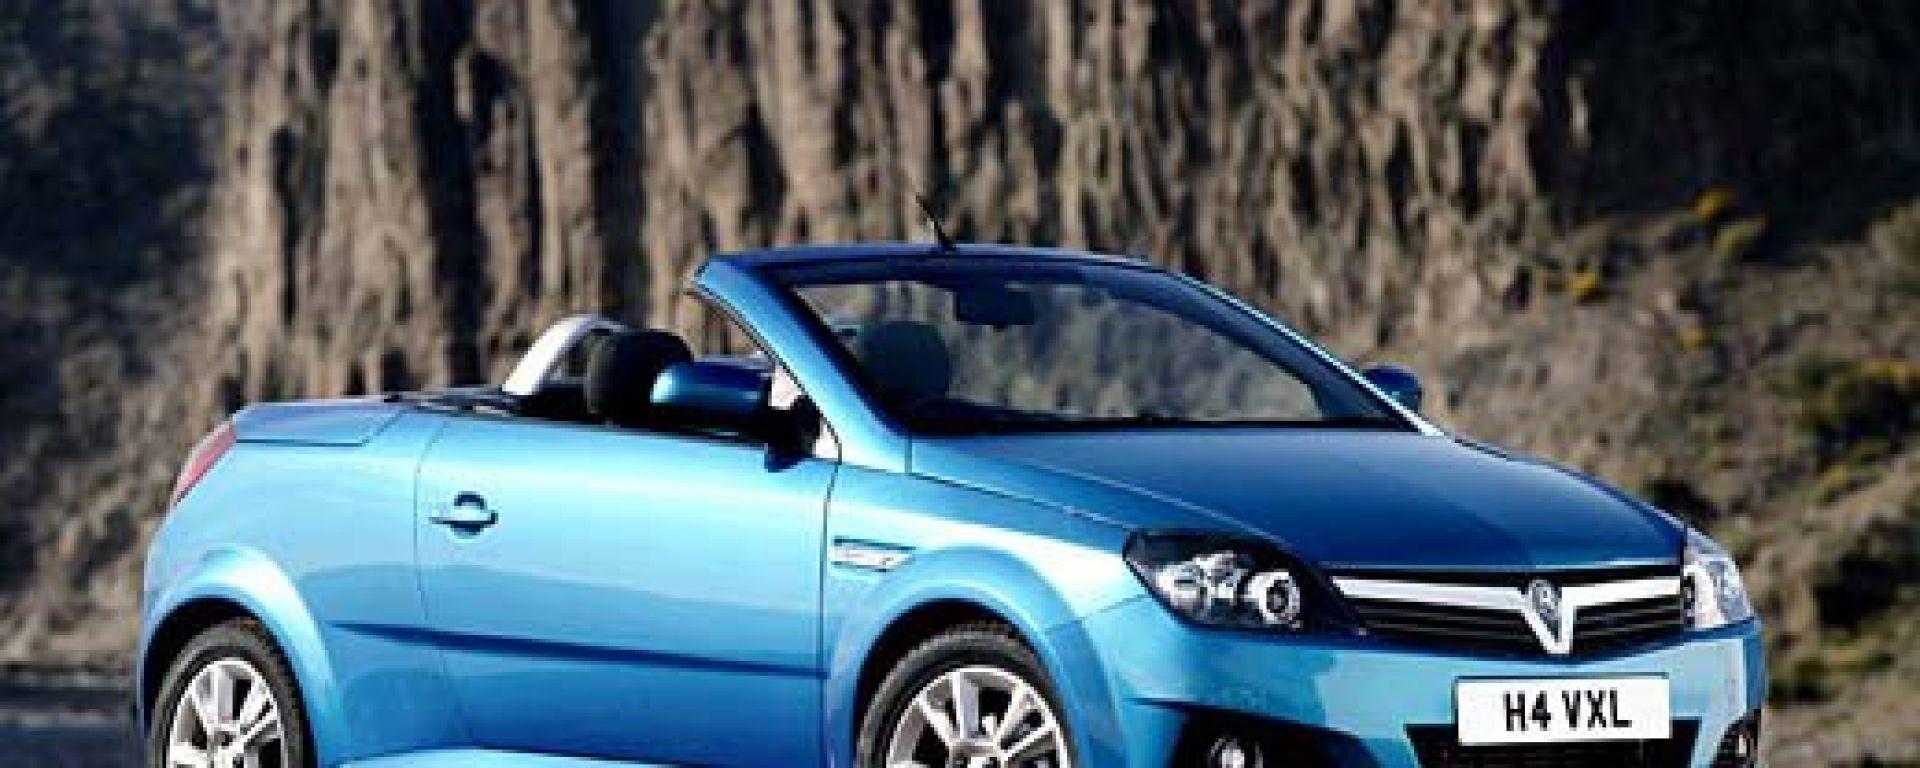 Anteprima: Opel Tigra TwinTop